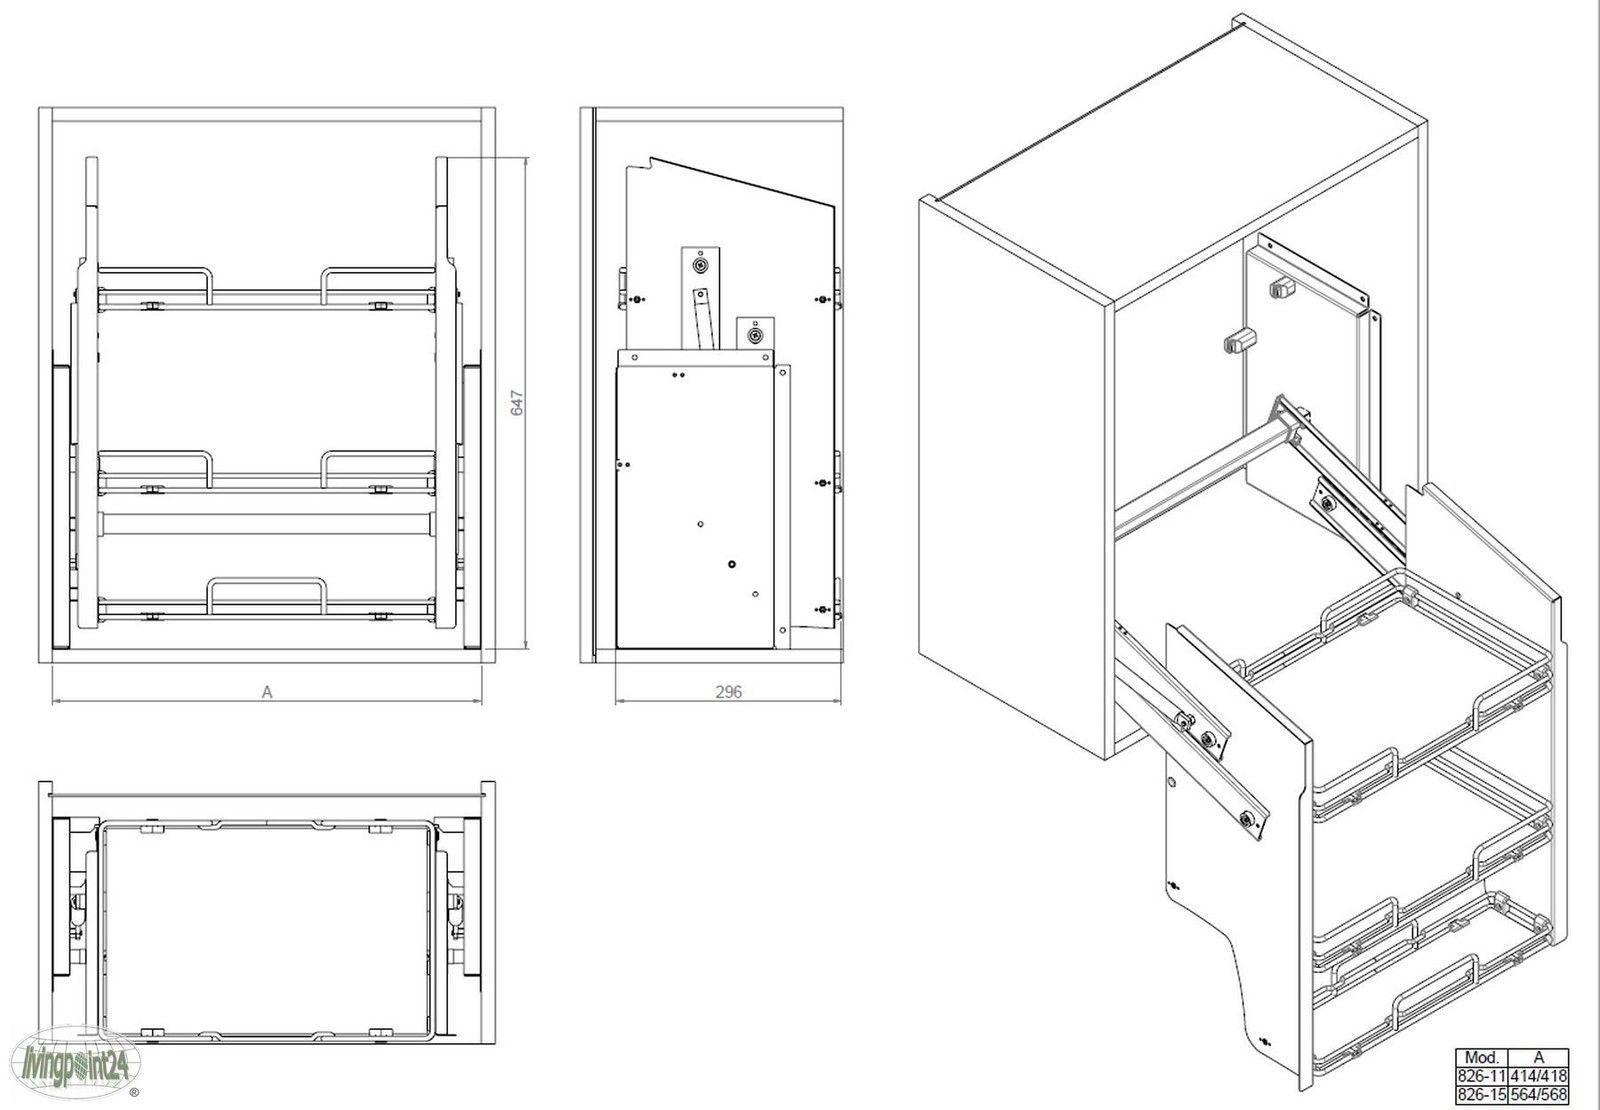 ikea oberschrank kche hinreiend ikea oberschrank kche idee ikea metod with ikea oberschrank. Black Bedroom Furniture Sets. Home Design Ideas